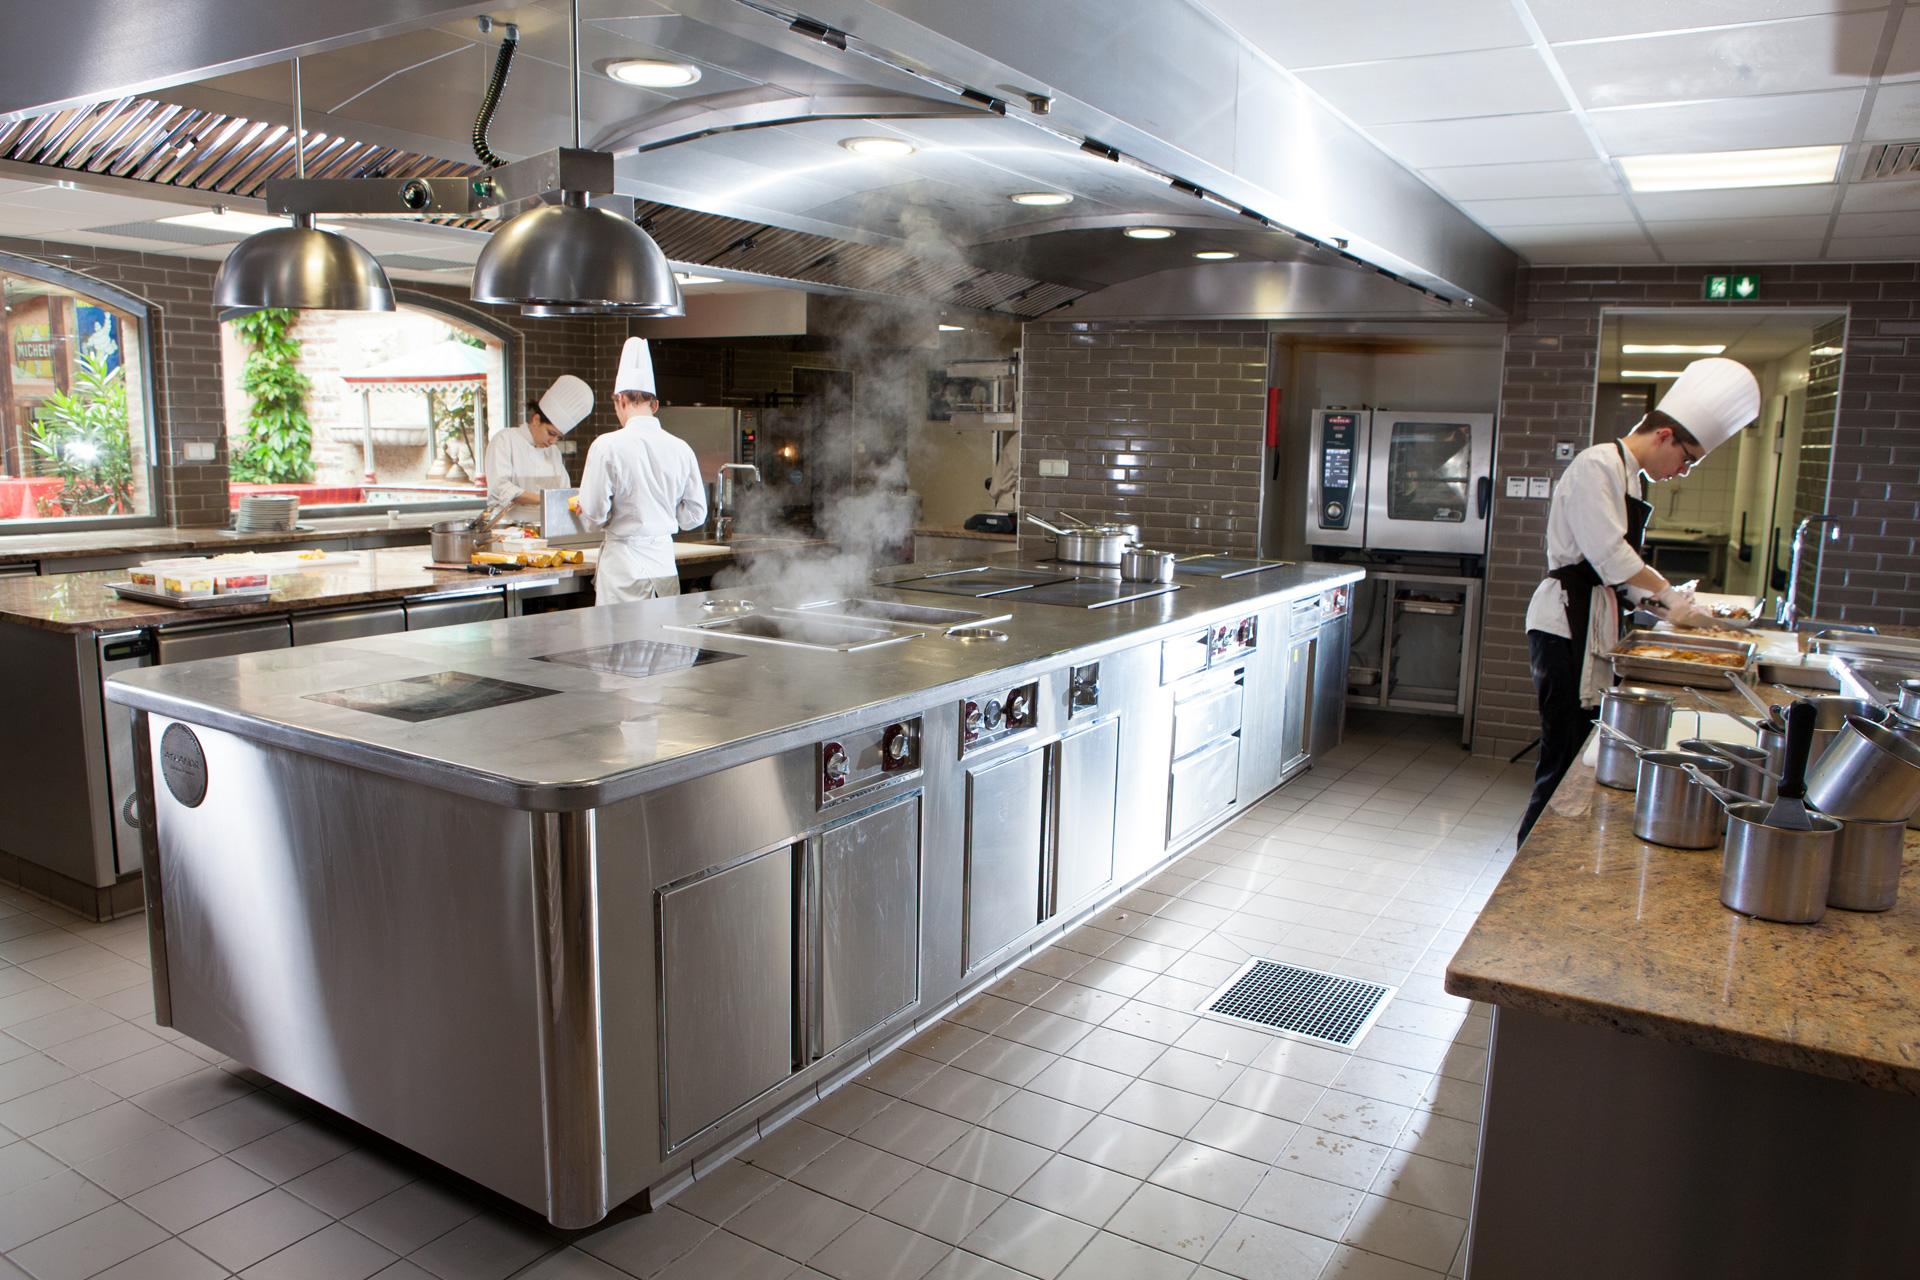 Home Joseph Climatisation Cuisine Professionnelle Froid